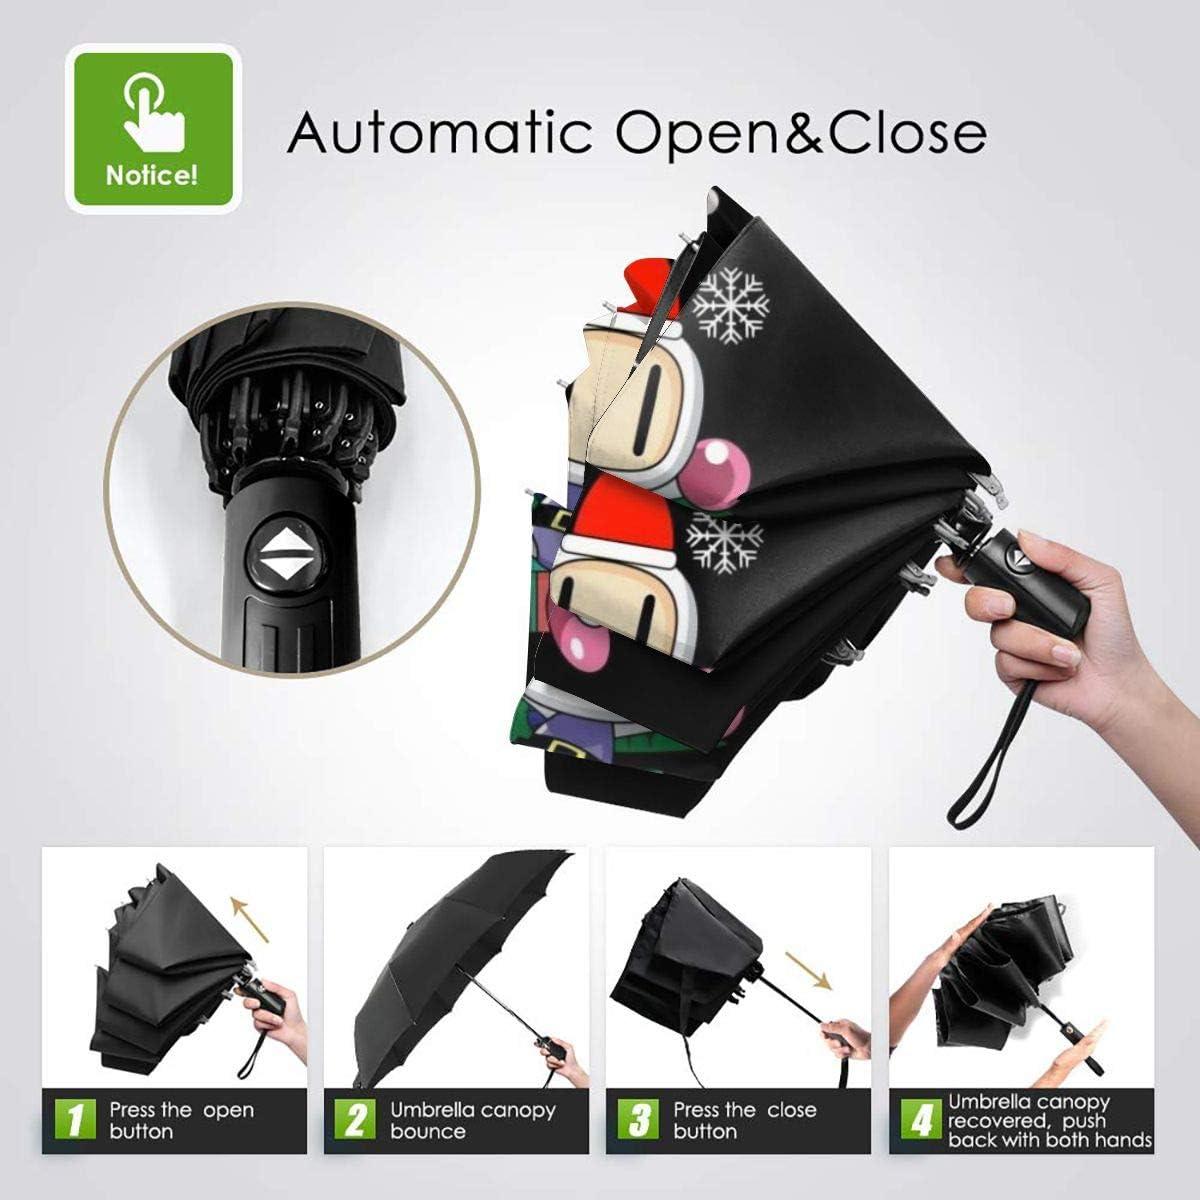 Bomberman Around The Christmas Tree Windproof Compact Auto Open And Close Folding Umbrella,Automatic Foldable Travel Parasol Umbrella